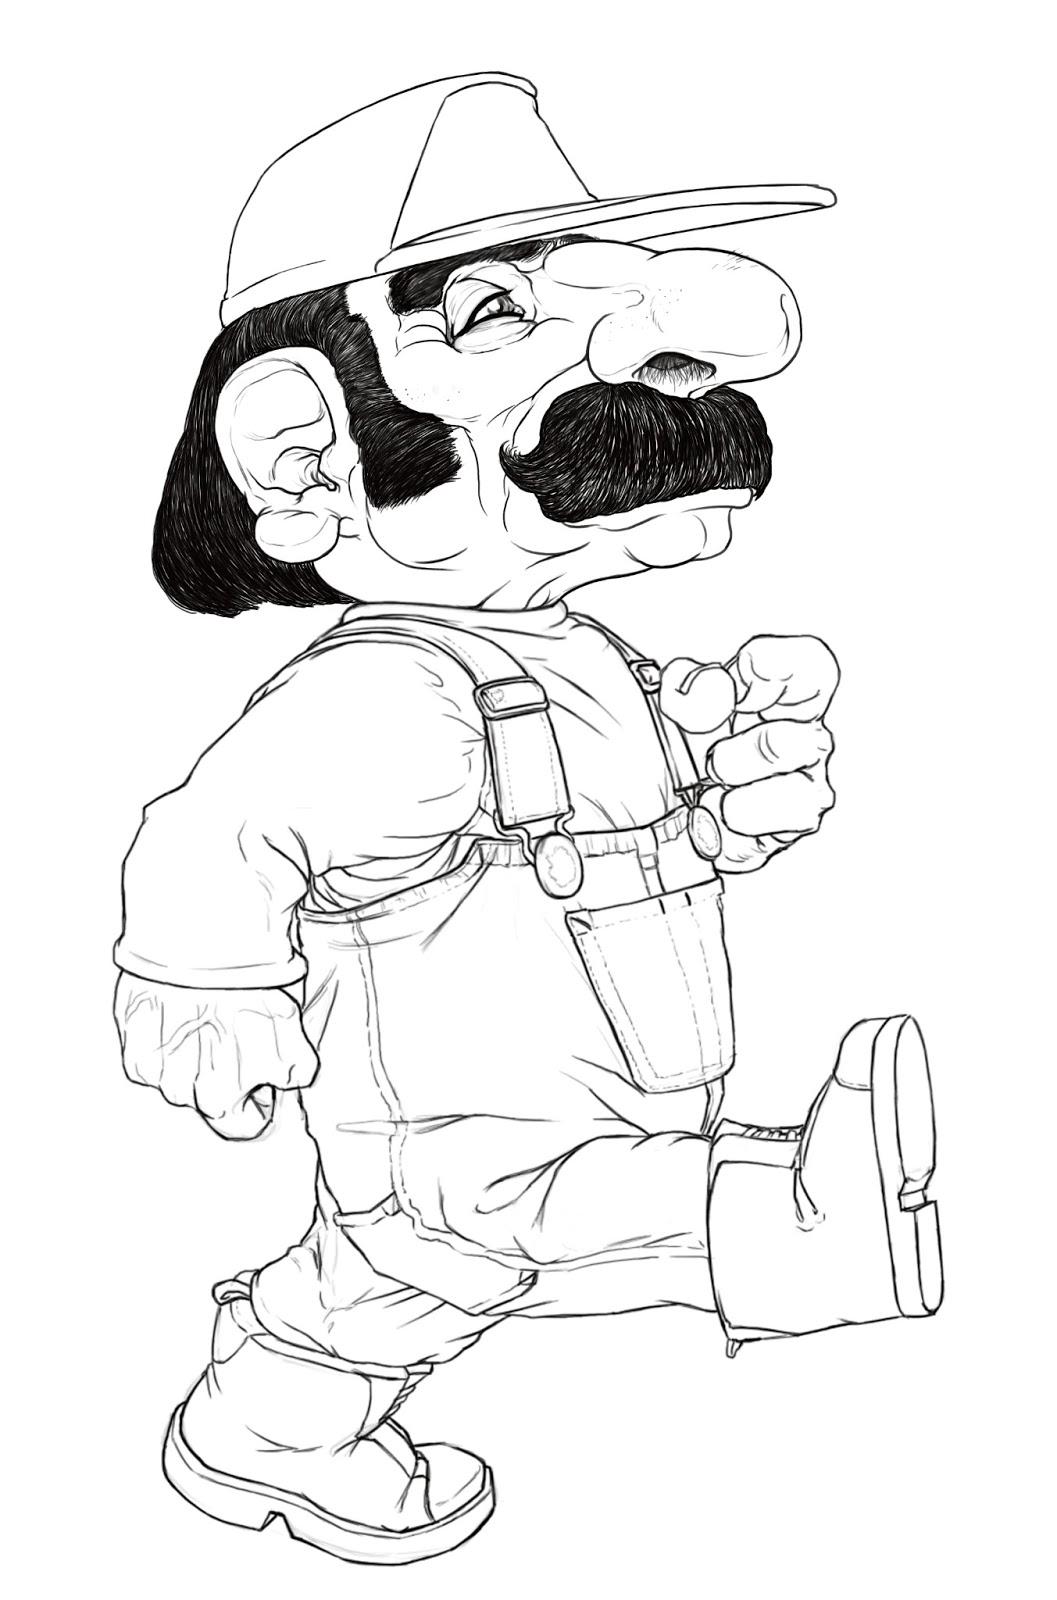 Alessandro Piedimonte's Blog: It's a me Realistic Mario!